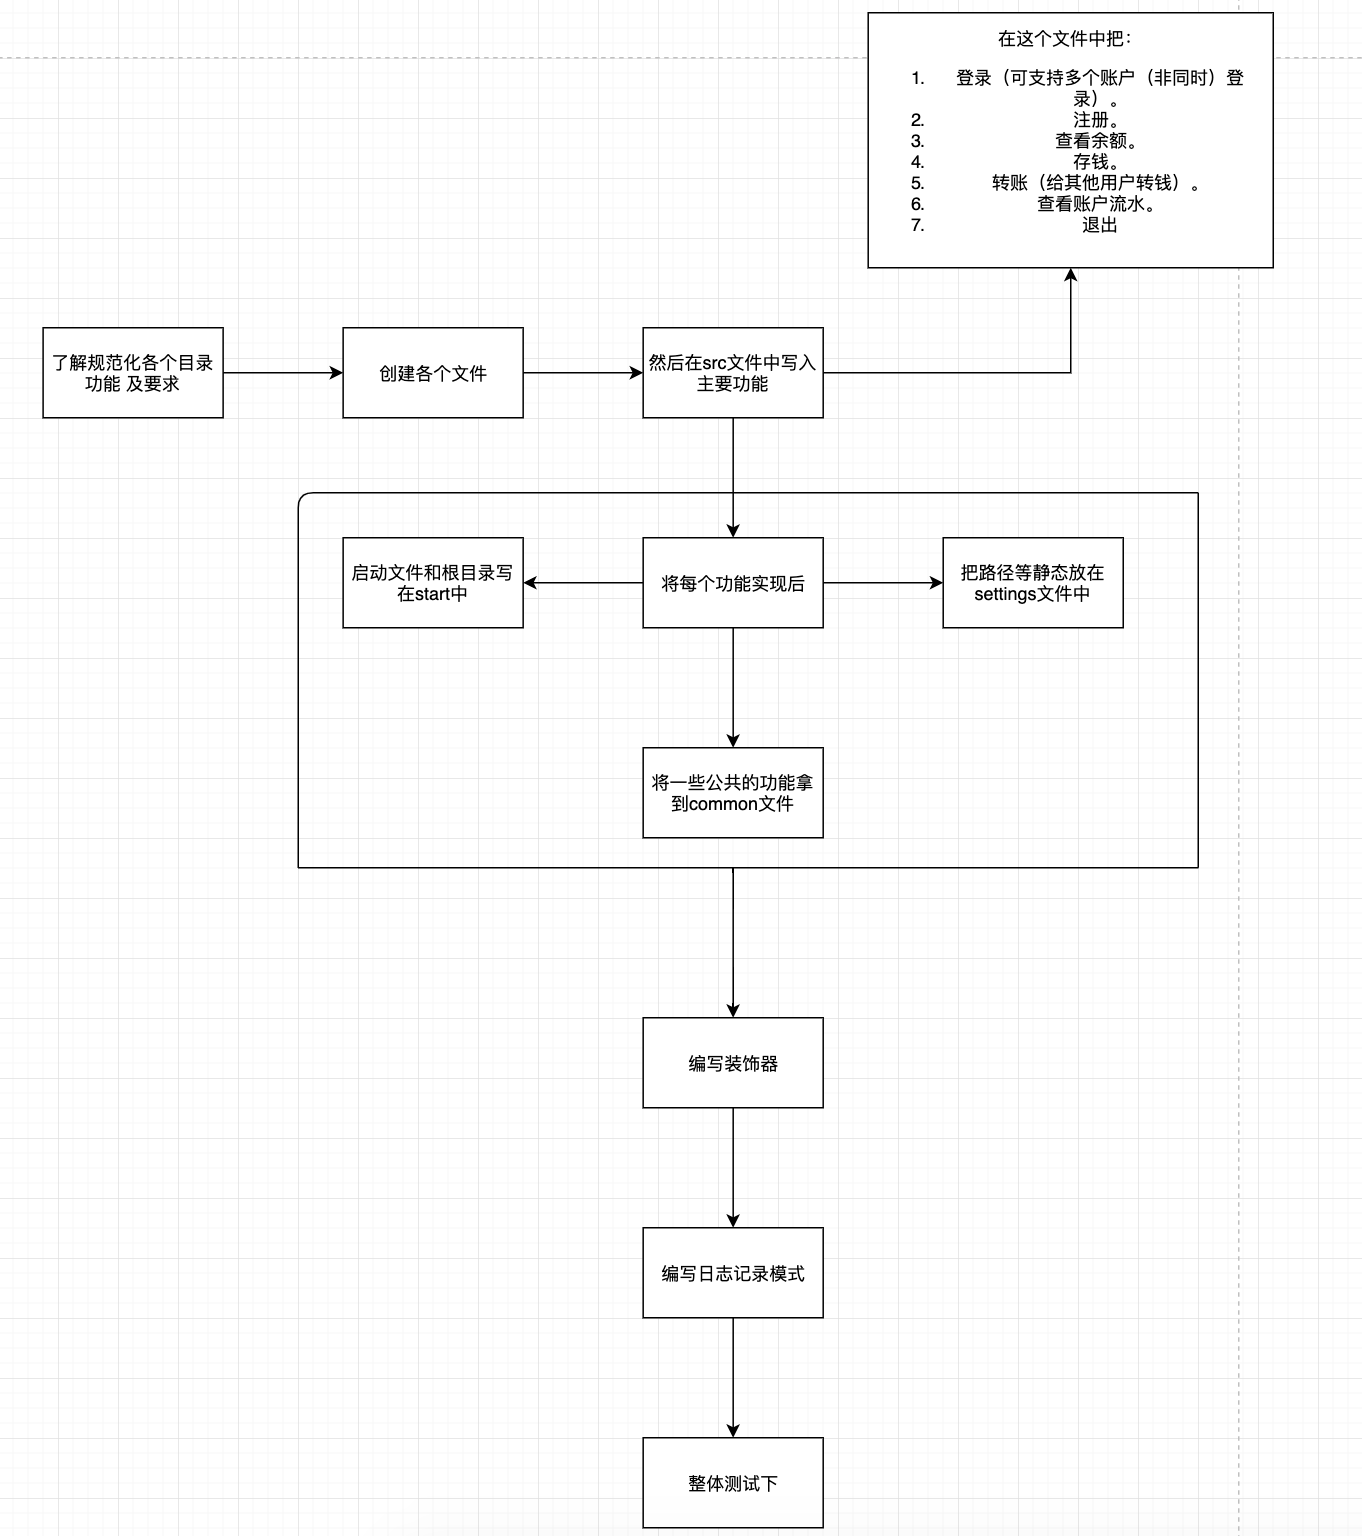 python规范化模拟Atm取款机的相关操作